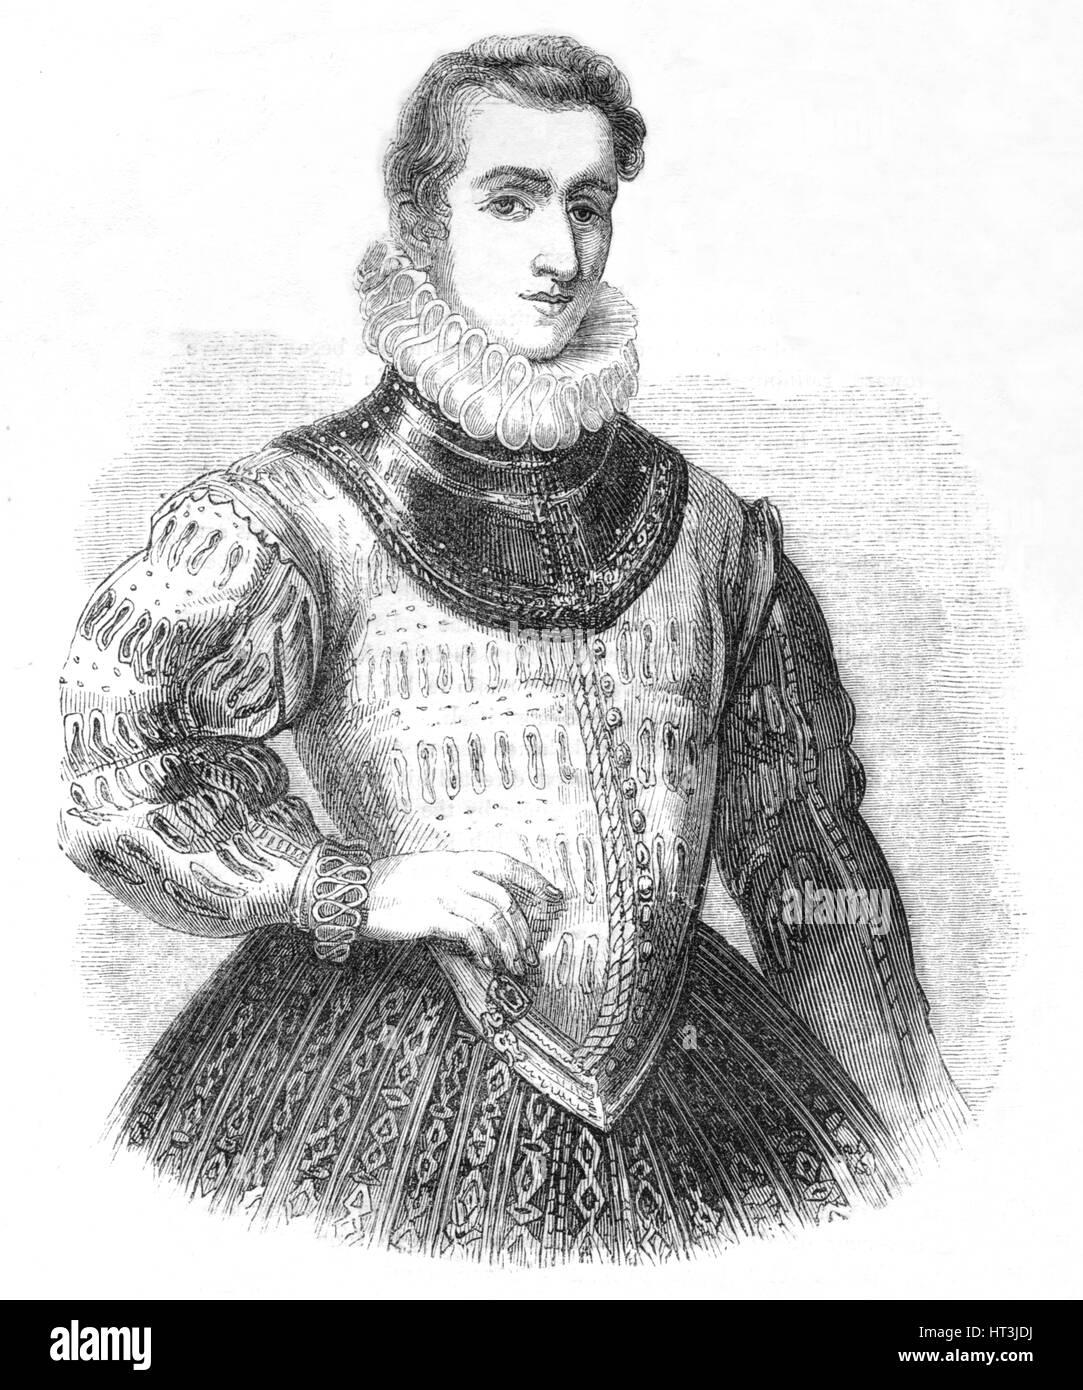 'Sir Philip Sidney', 1845. Artist: Unknown. - Stock Image